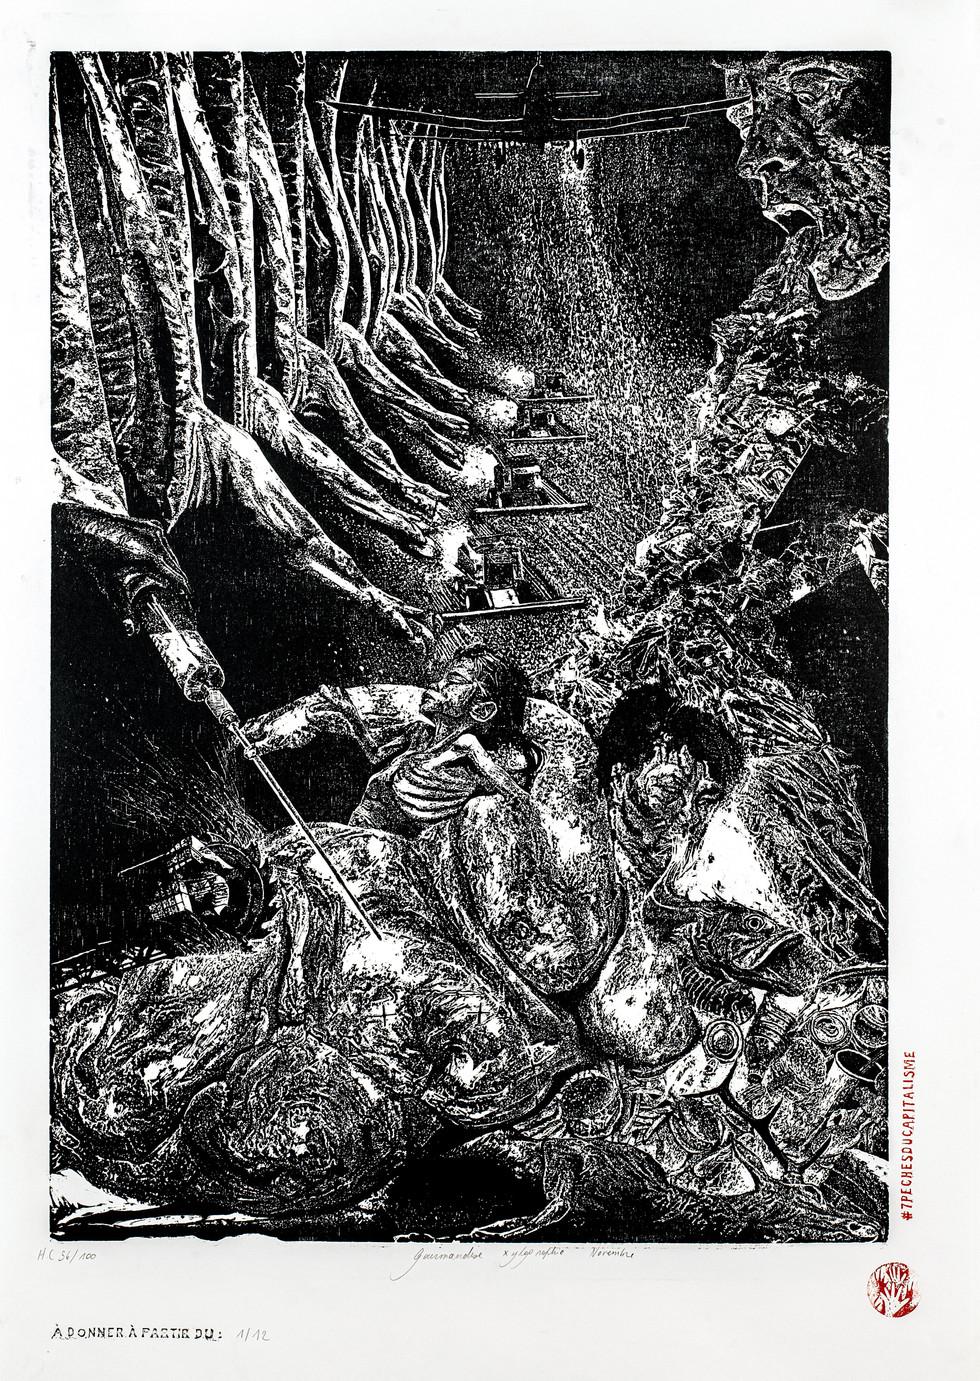 Gourmandise I, 56-100, xylographie, 70 x 100cm, 2019